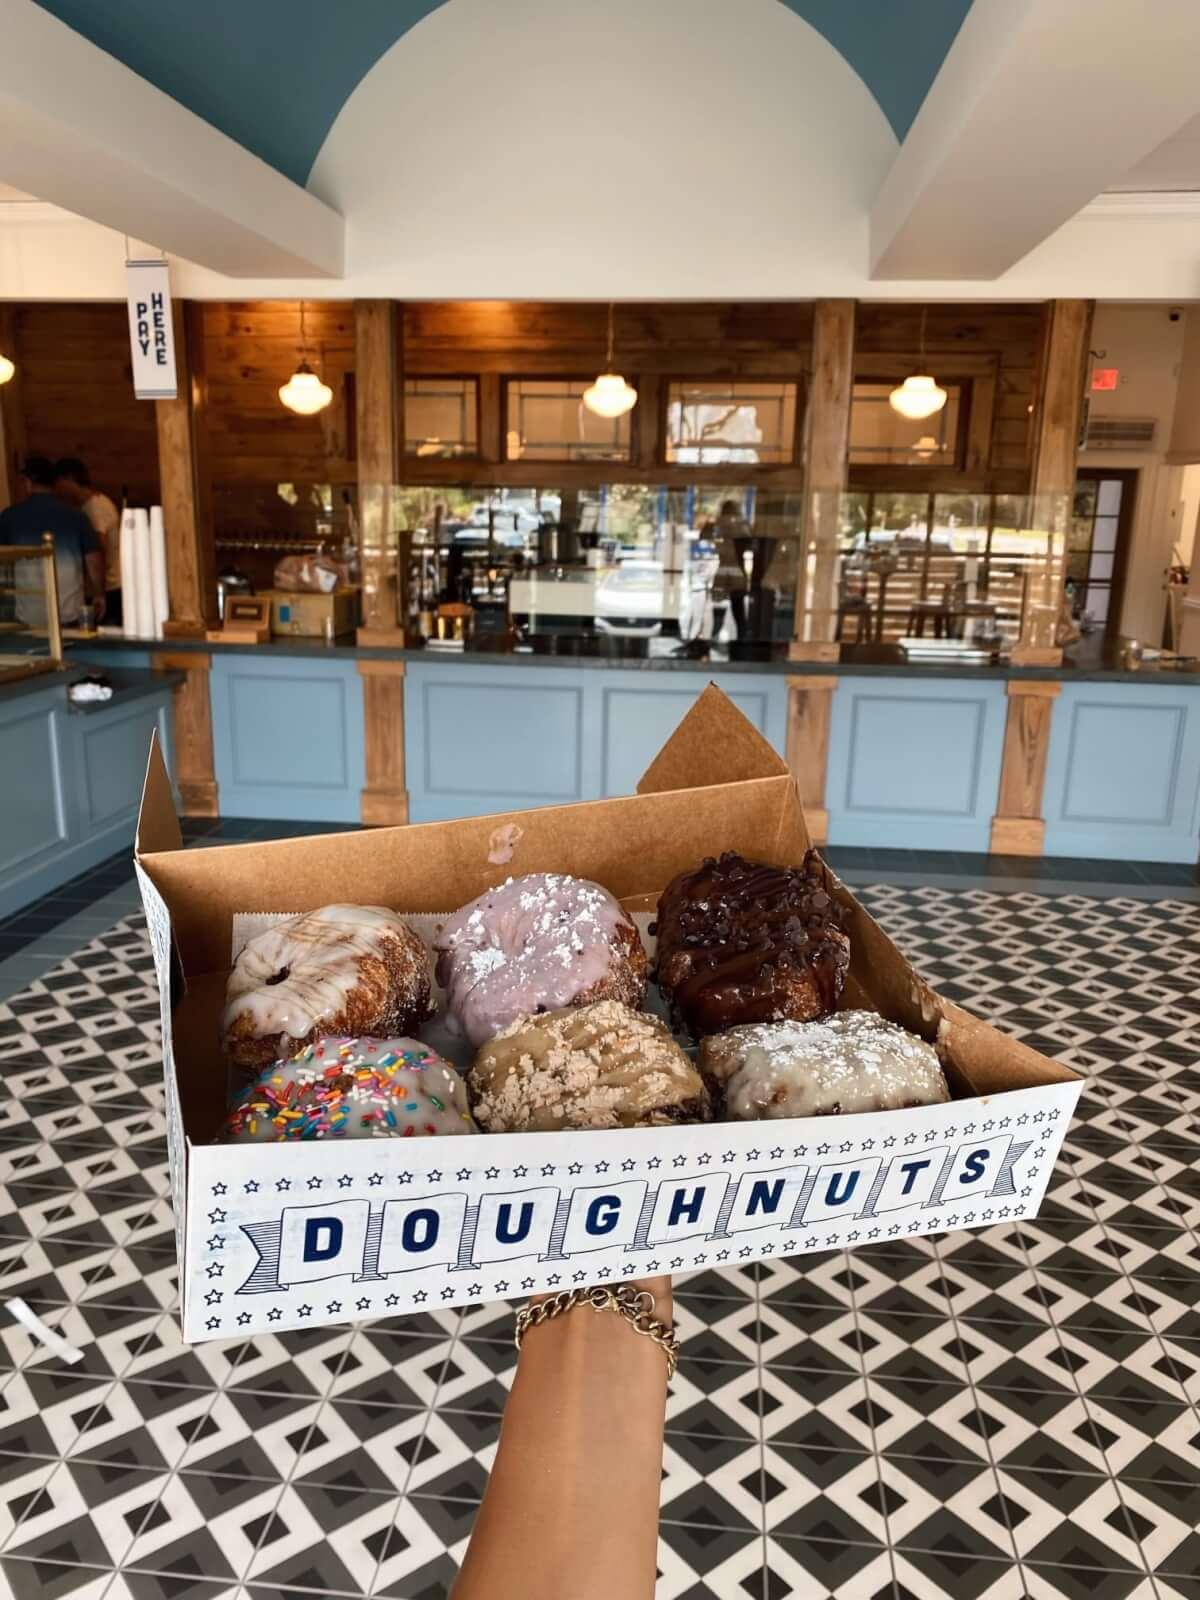 Amazing box of doughnuts